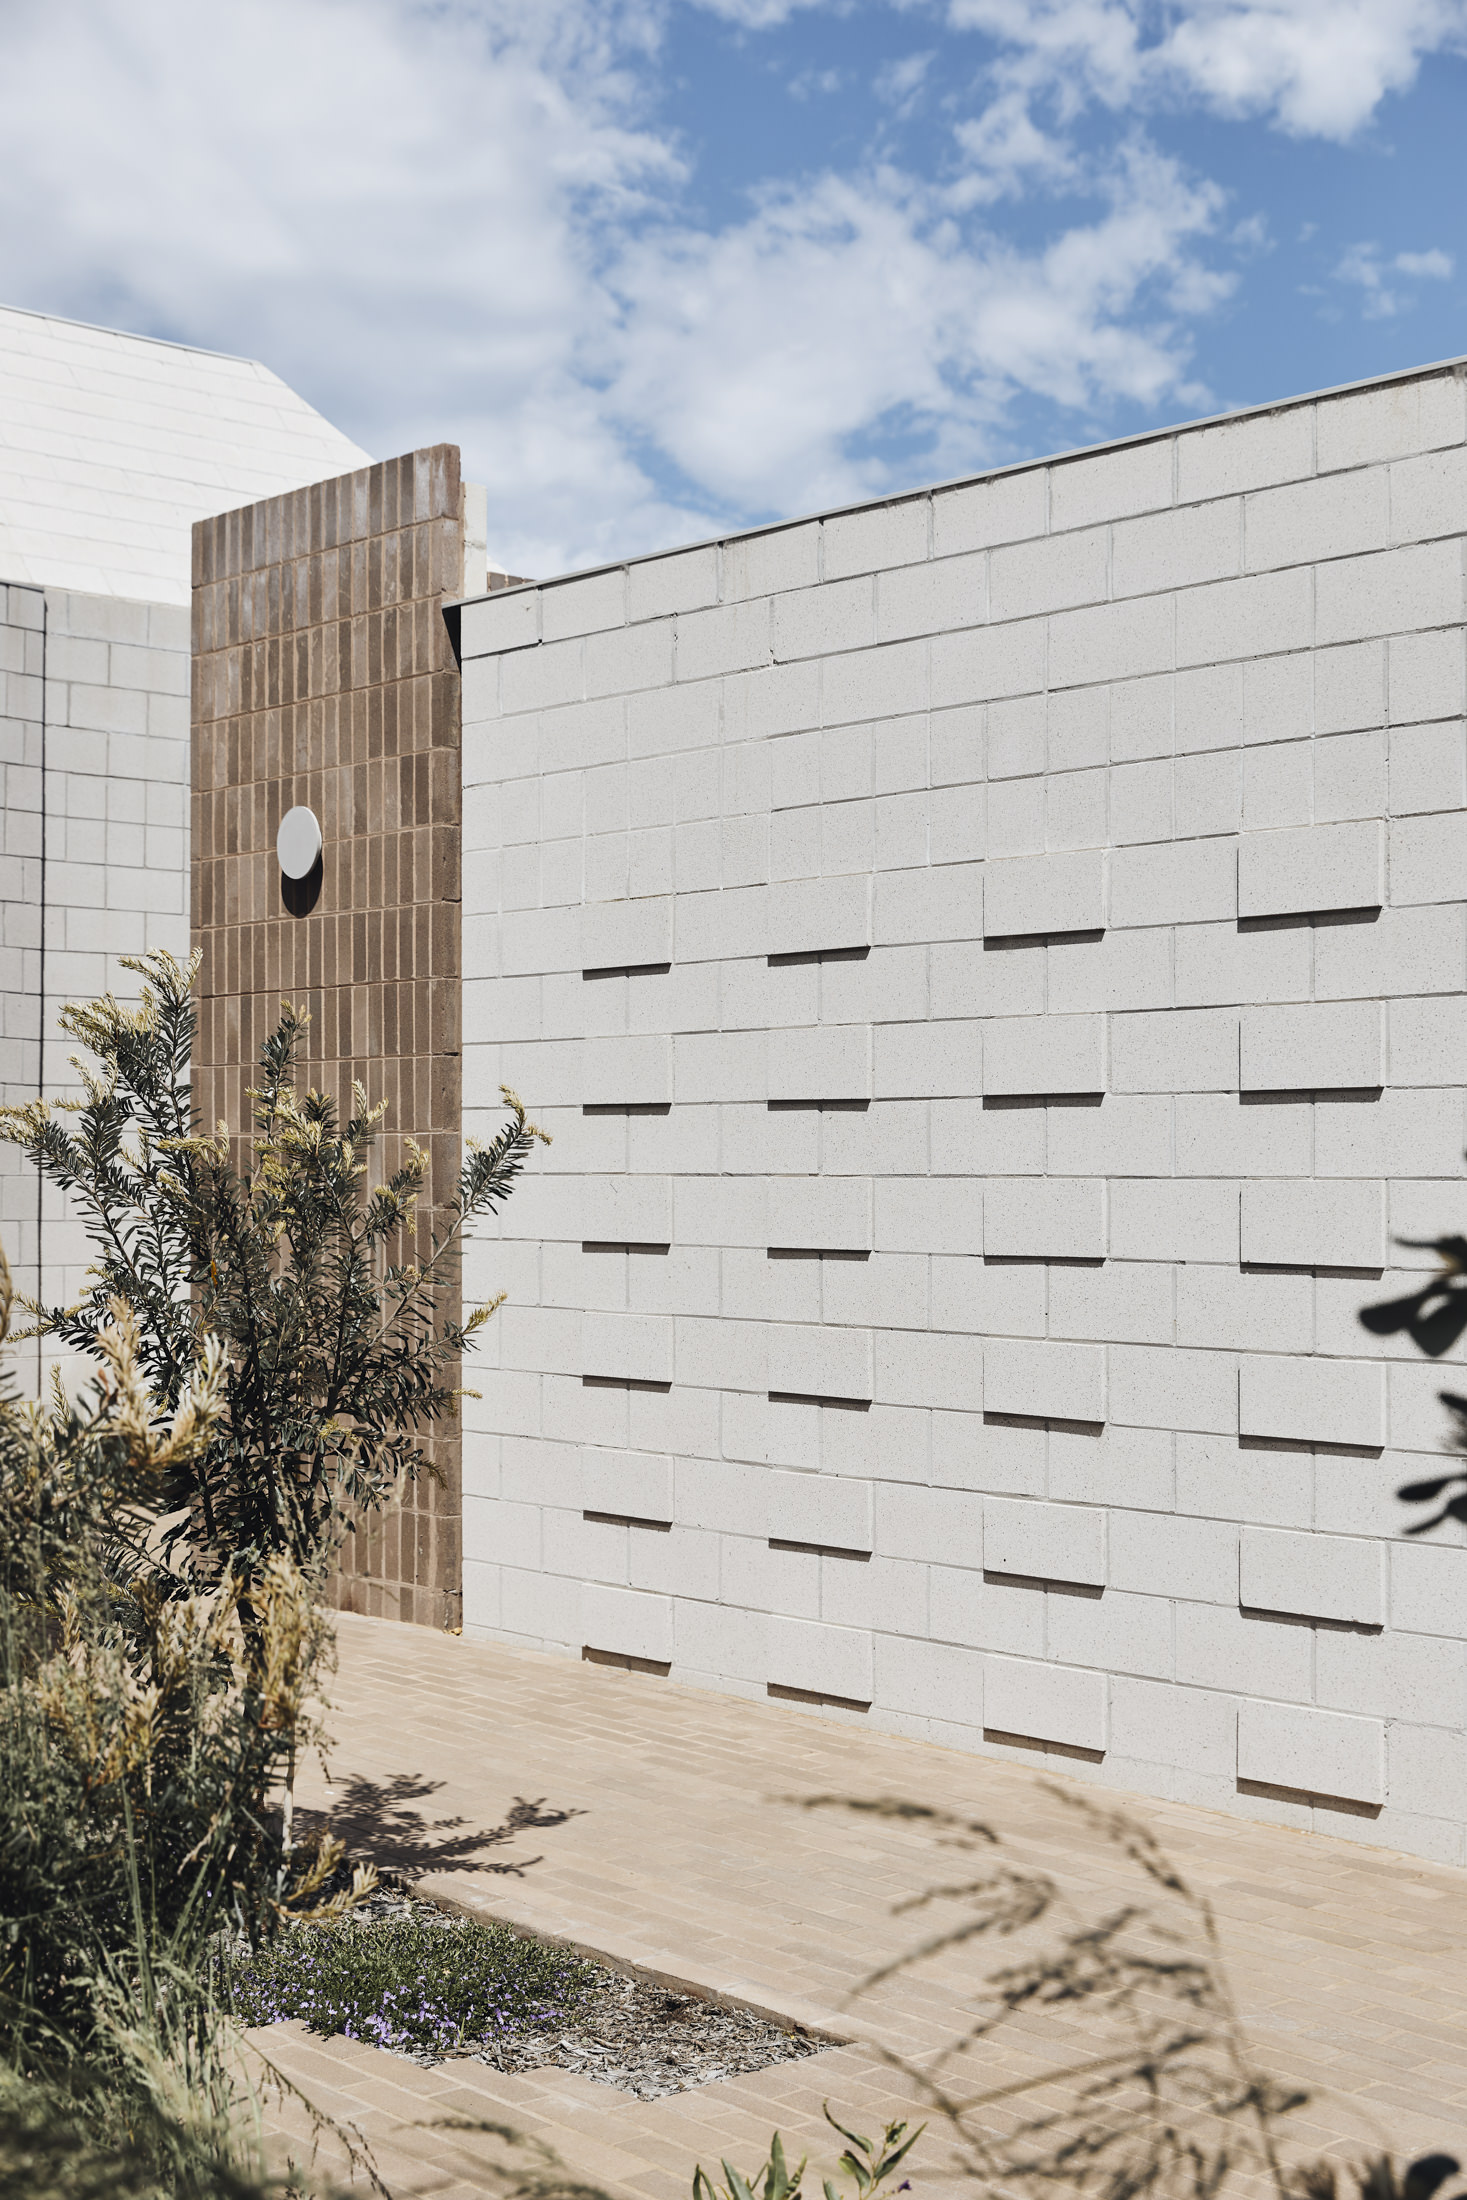 Architects Eat Bellows Beach House Flinders Masonry Architecture Photo Derek Swalwell Yellowtrace 54